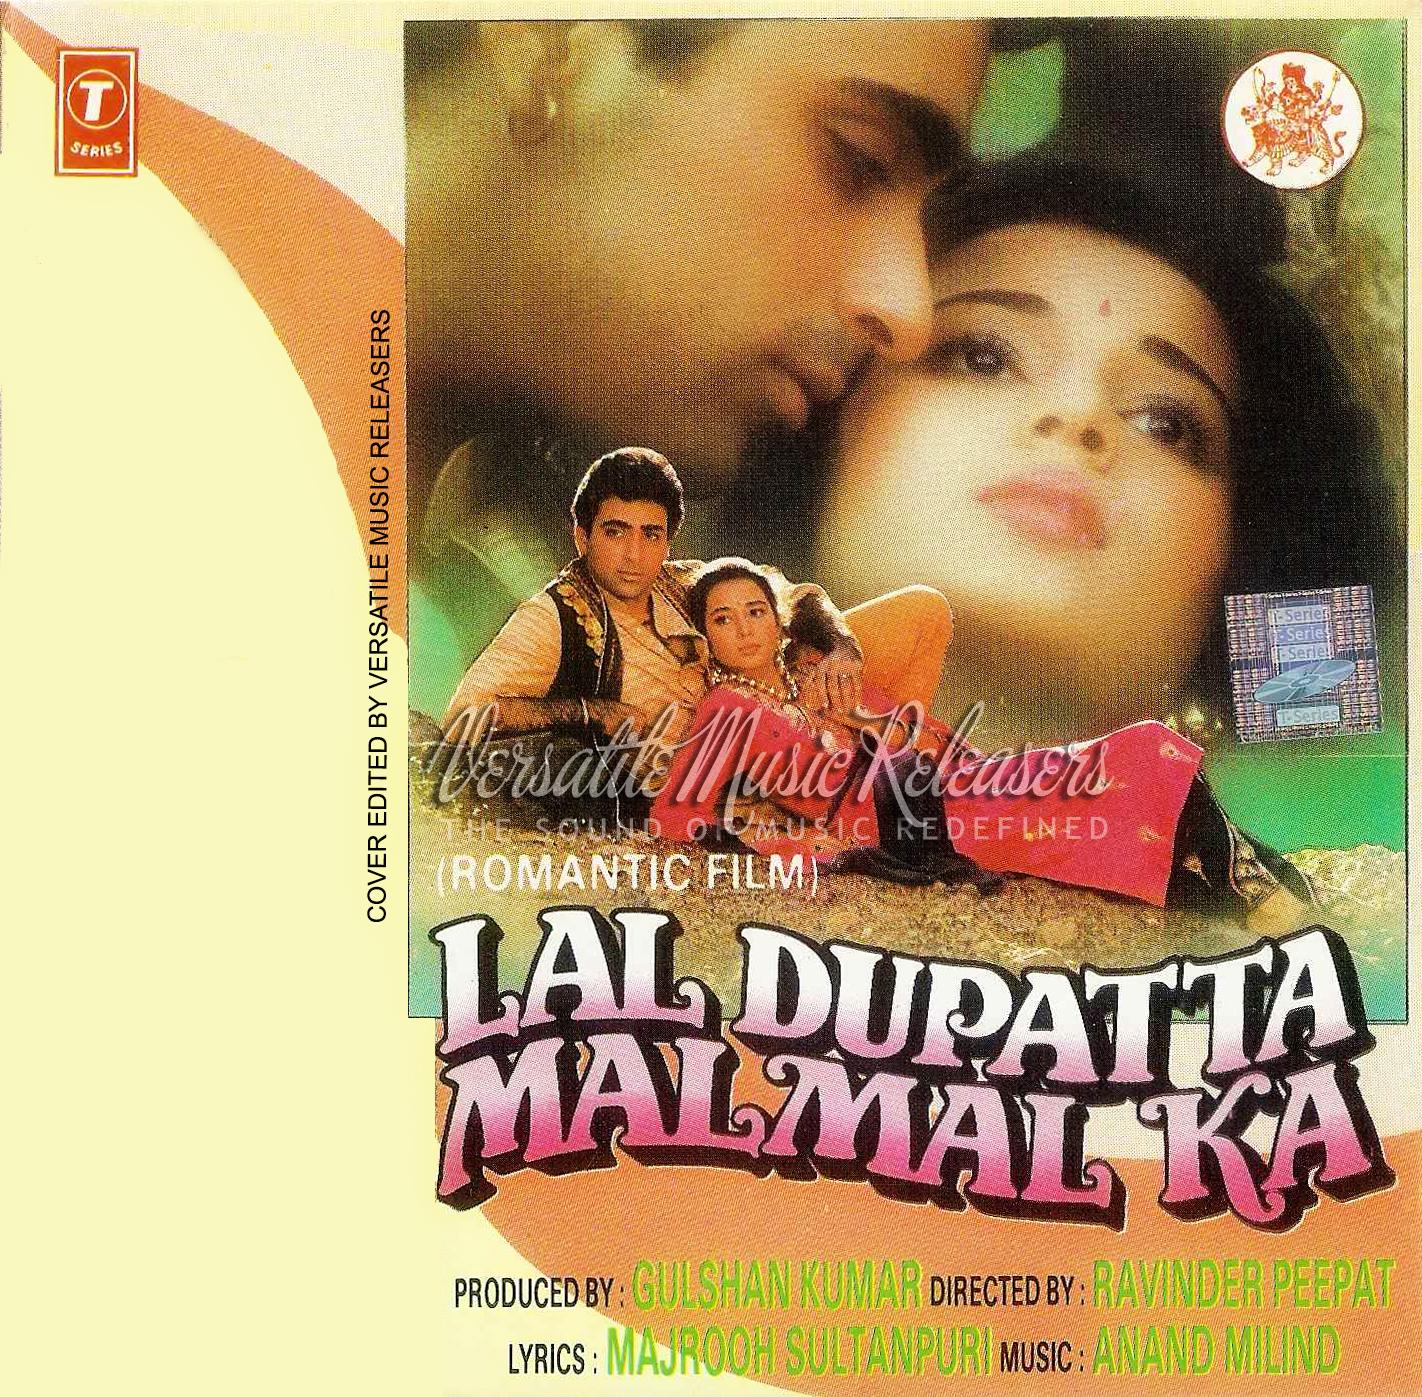 lal dupatta malmal ka mp3 songs free download 320kbps